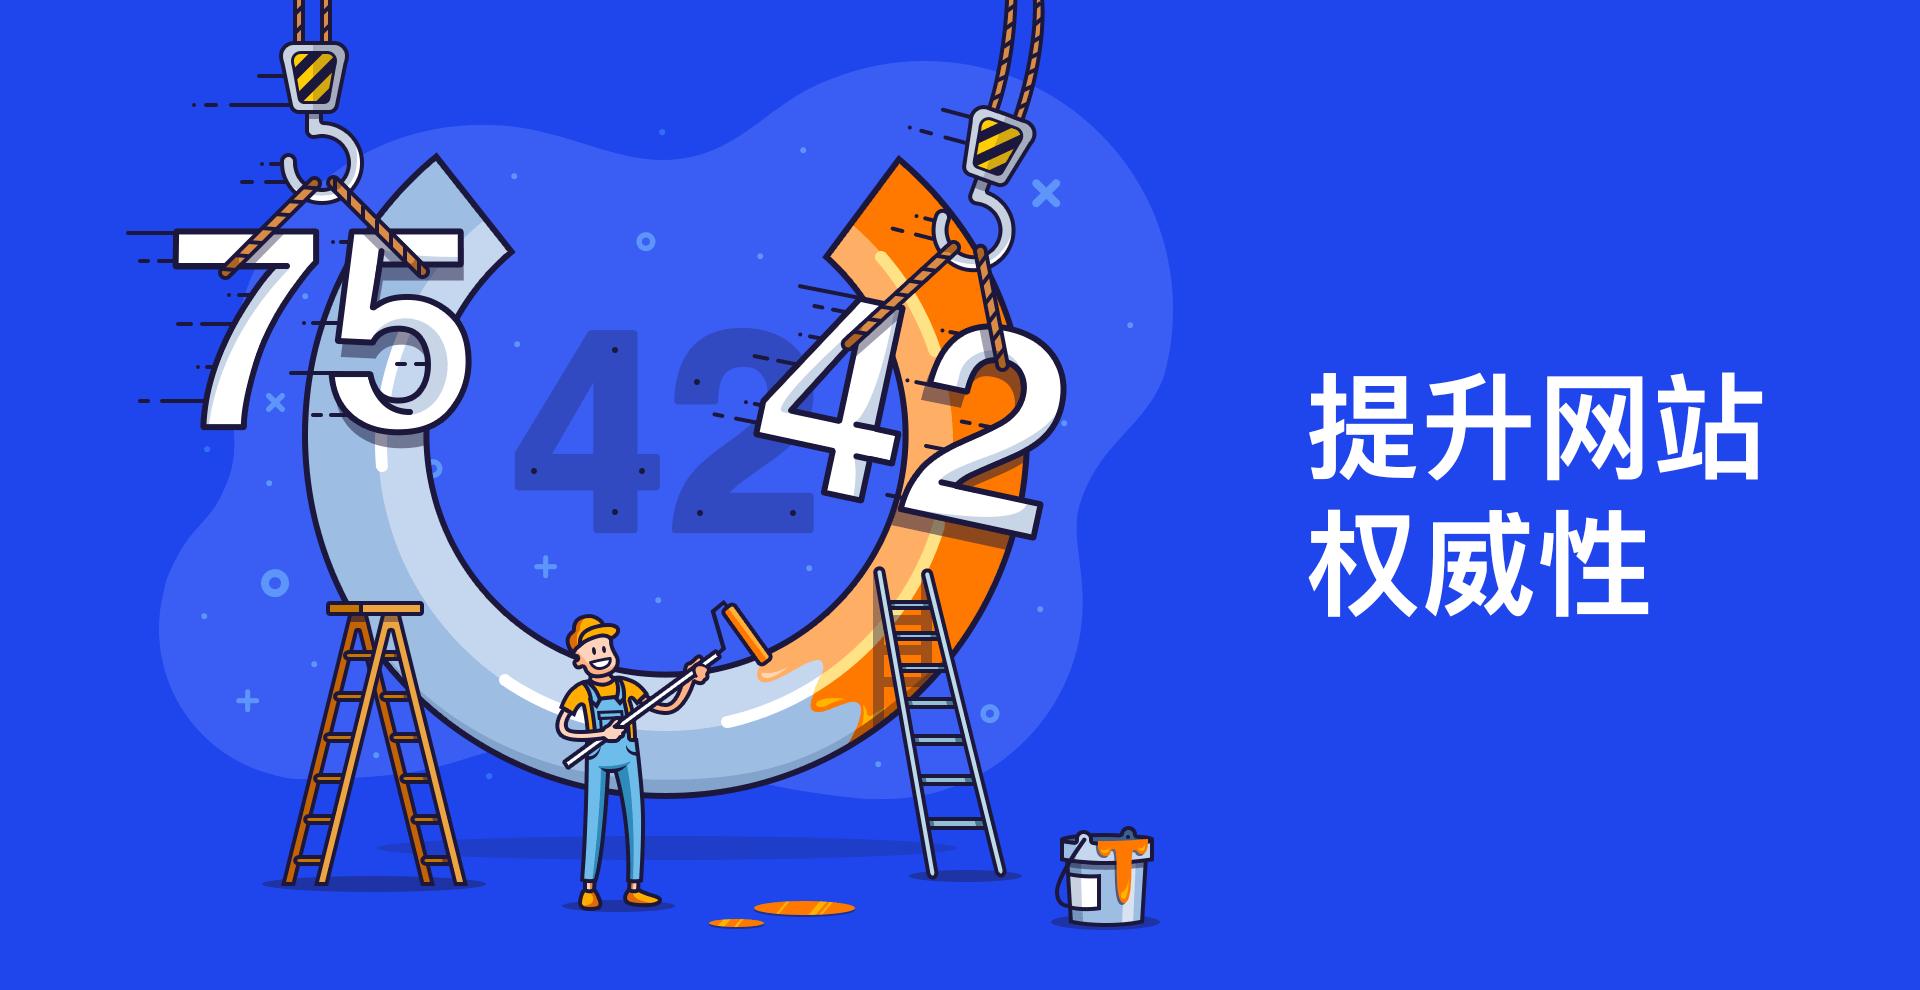 fb-increase-website-authority-cn